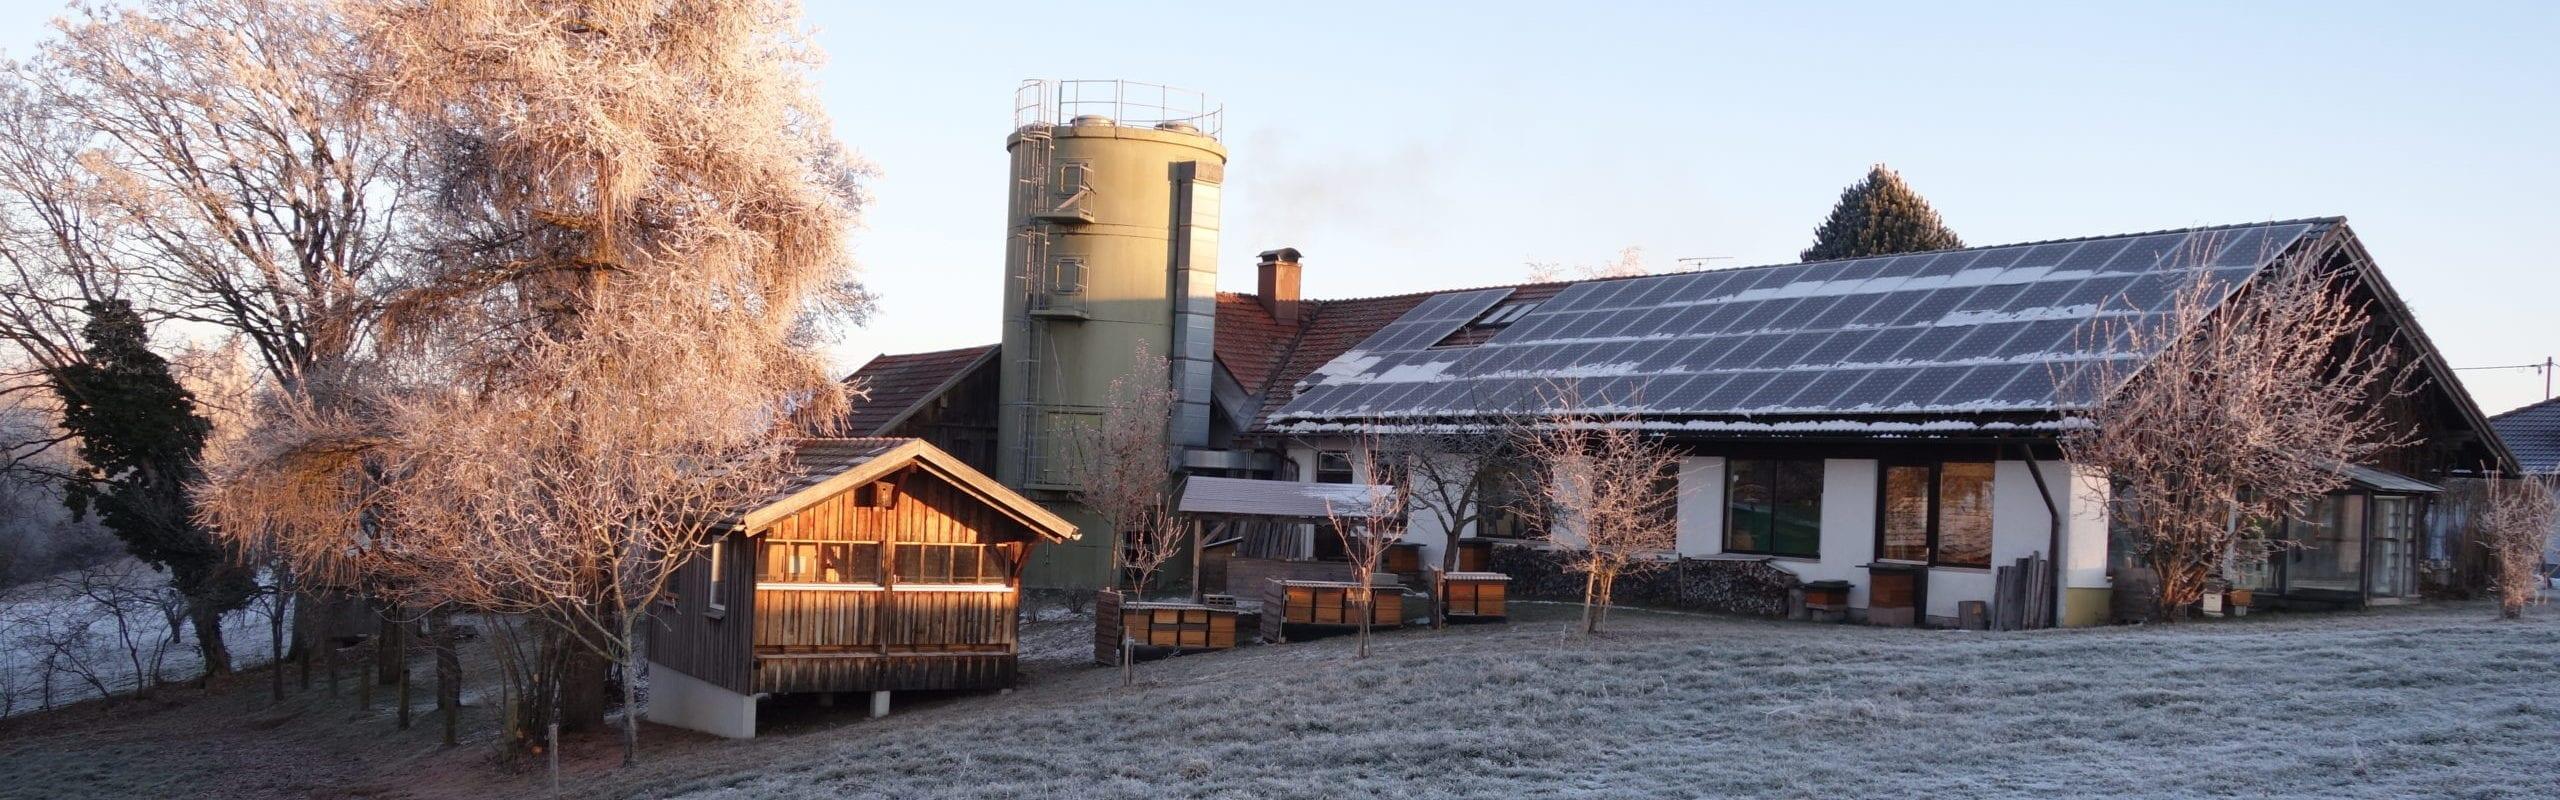 Imkereibedarf Altthaler - unser Betrieb im Herbst